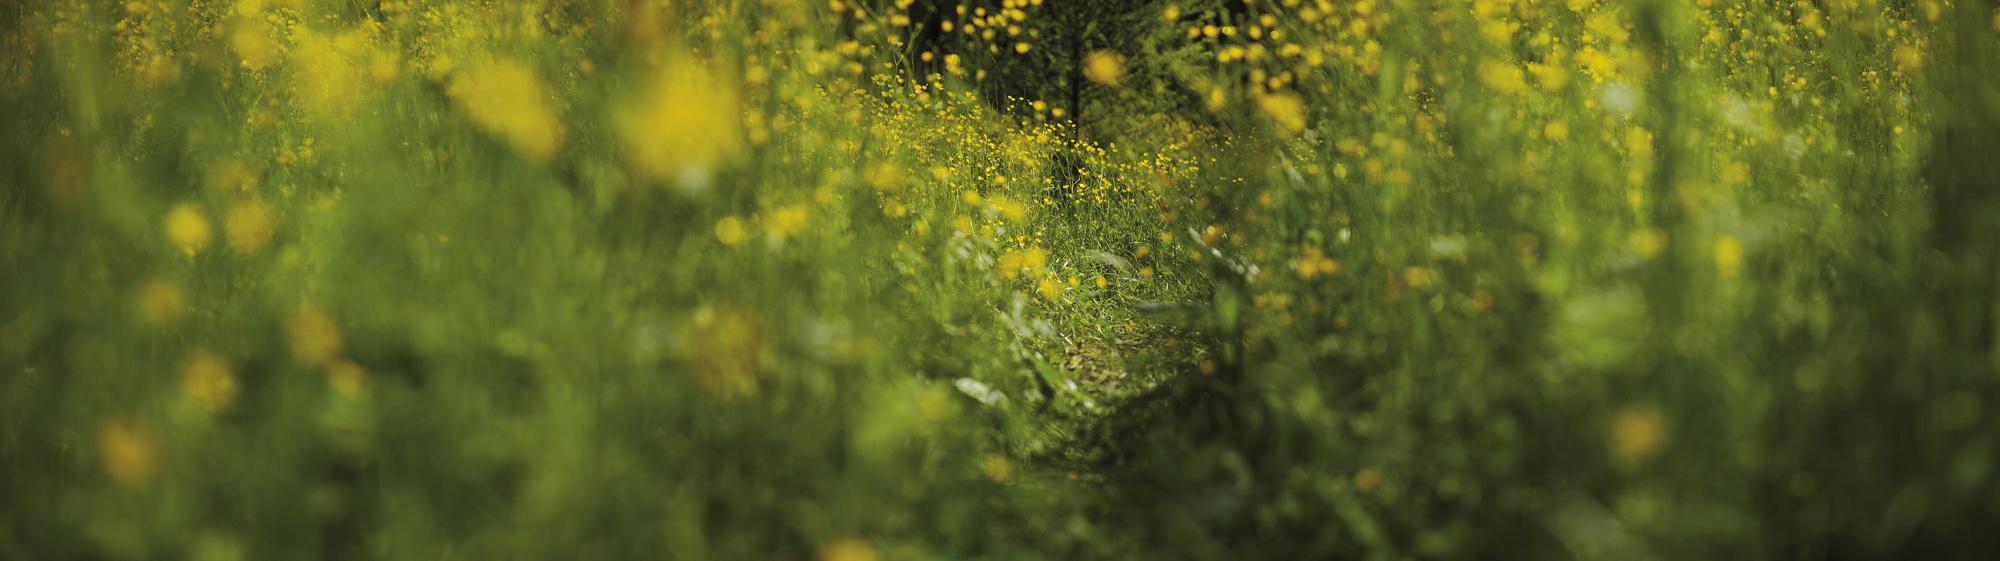 poteca cu flori galbene